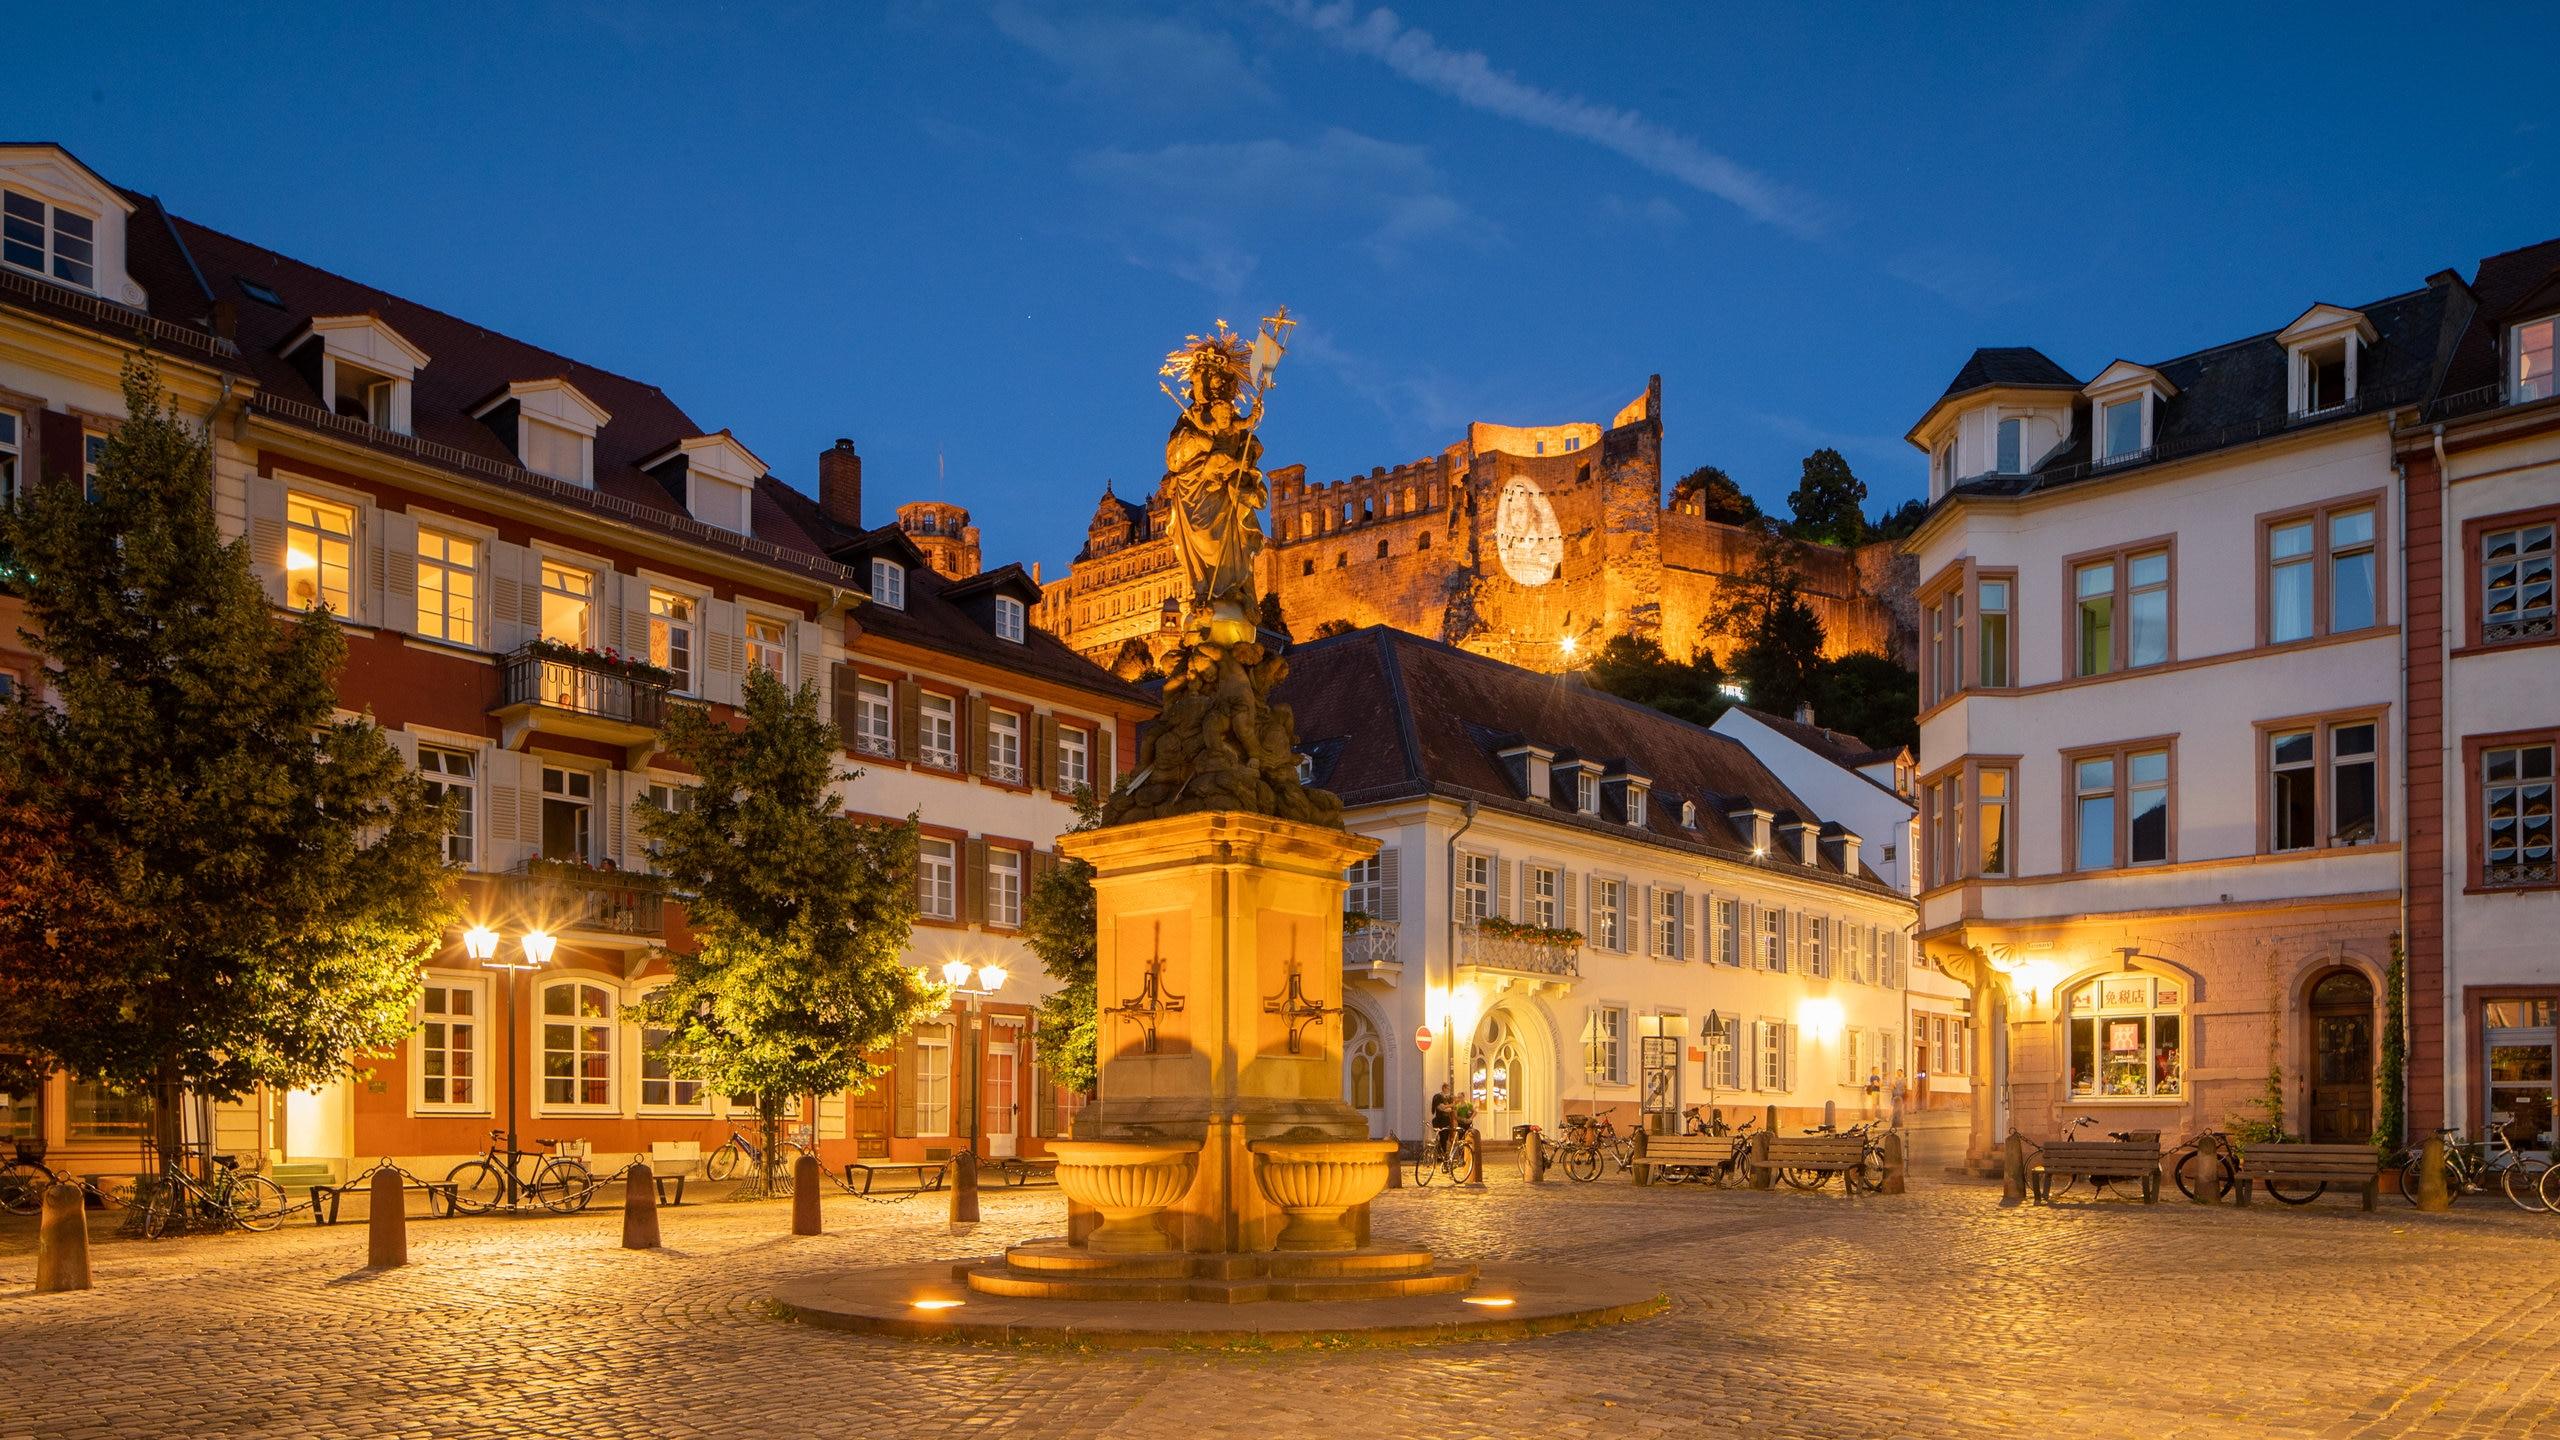 4 Sterne Hotels Heidelberg Baden Wurttemberg Hotels Expedia De